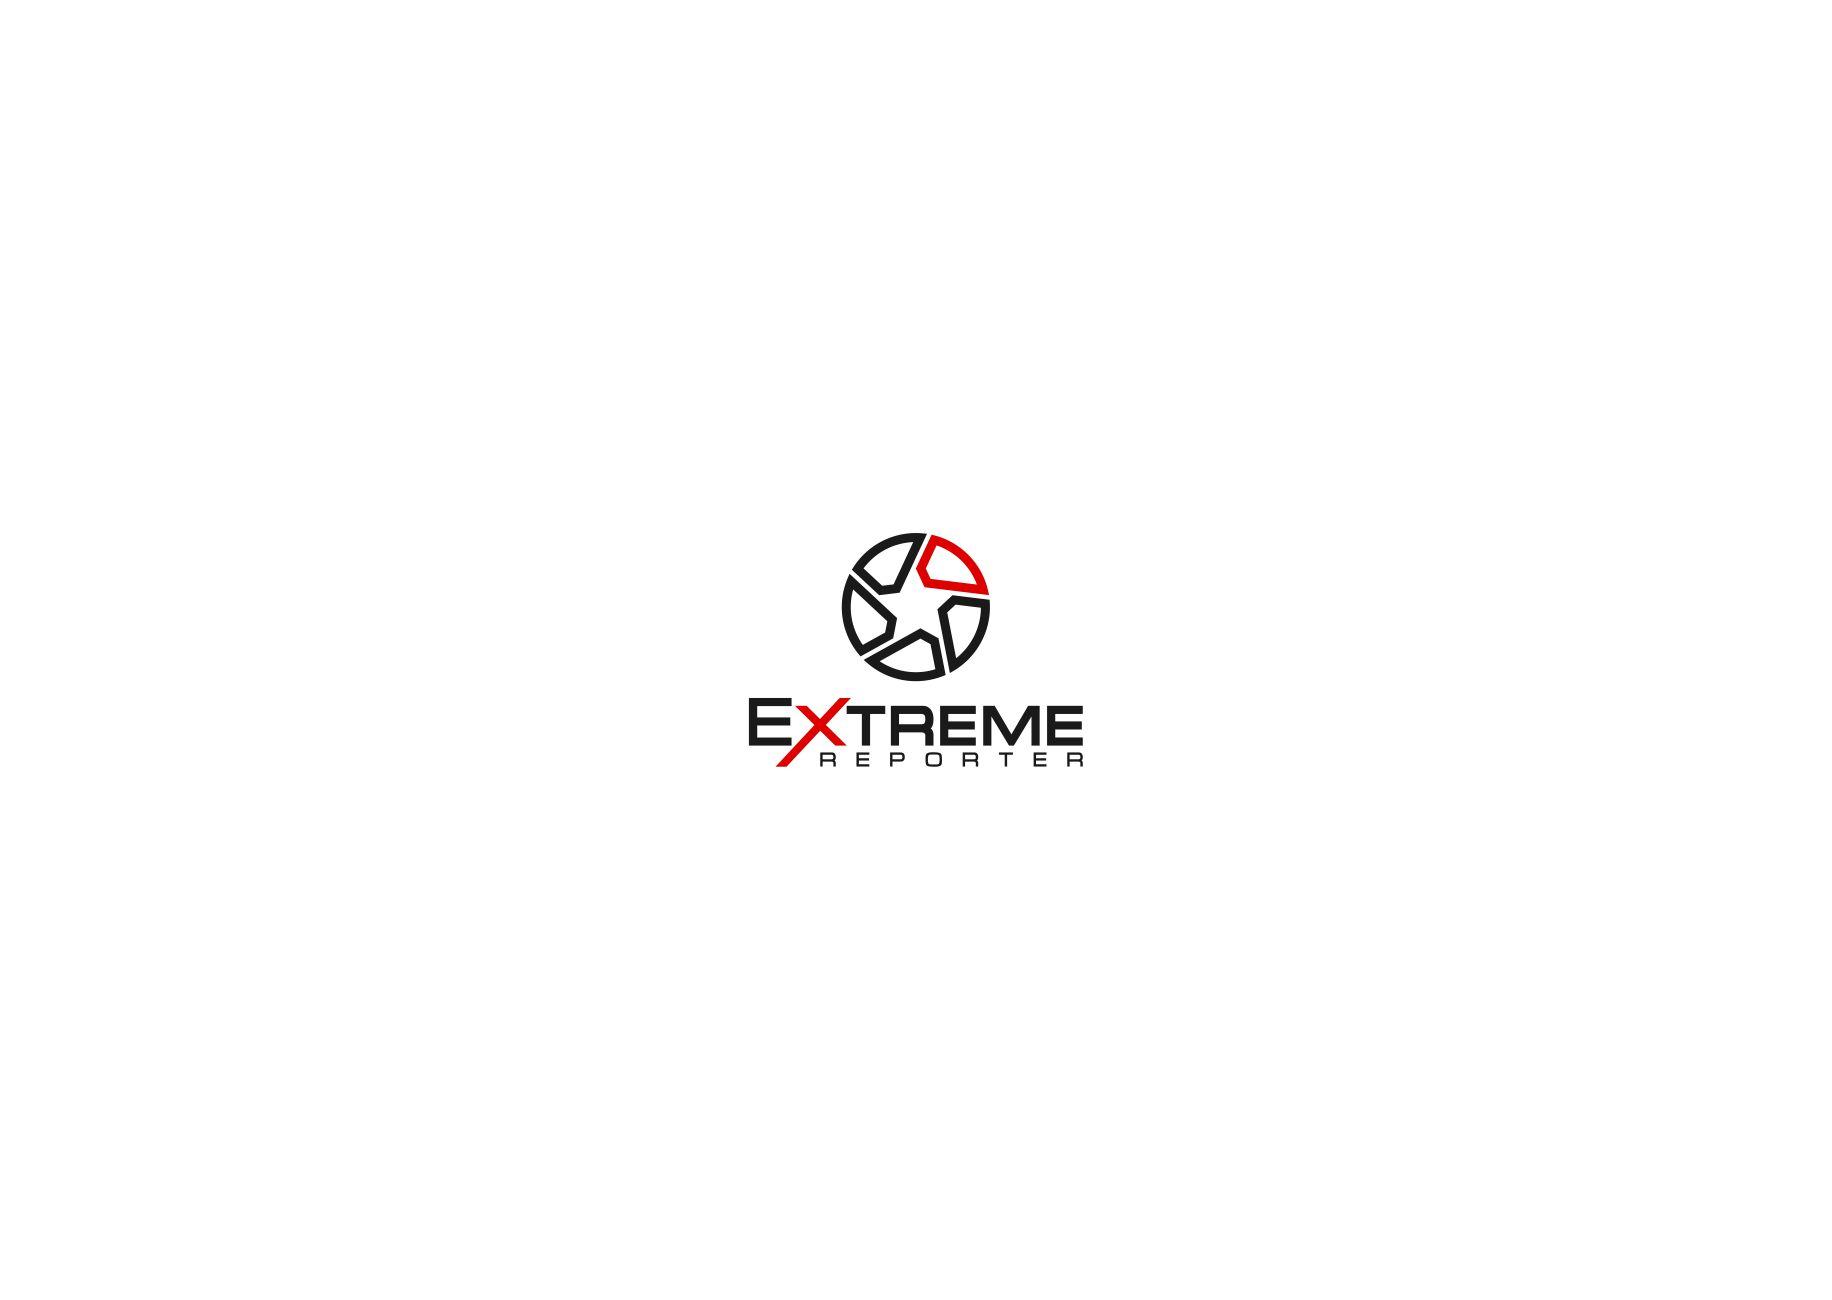 Логотип для экстрим фотографа.  фото f_2815a54deec628a7.jpg